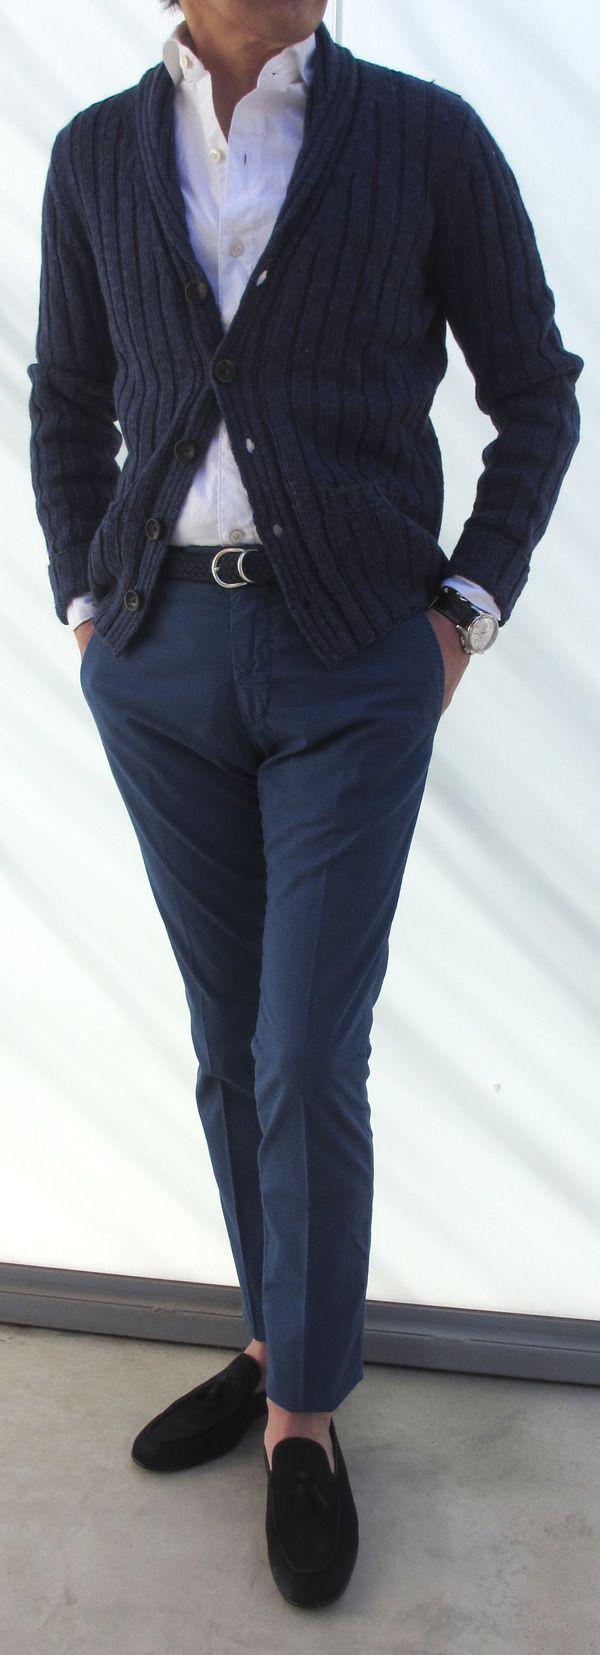 Navy shawl collar cardigan, white shirt, navy pants, black velvet slippers